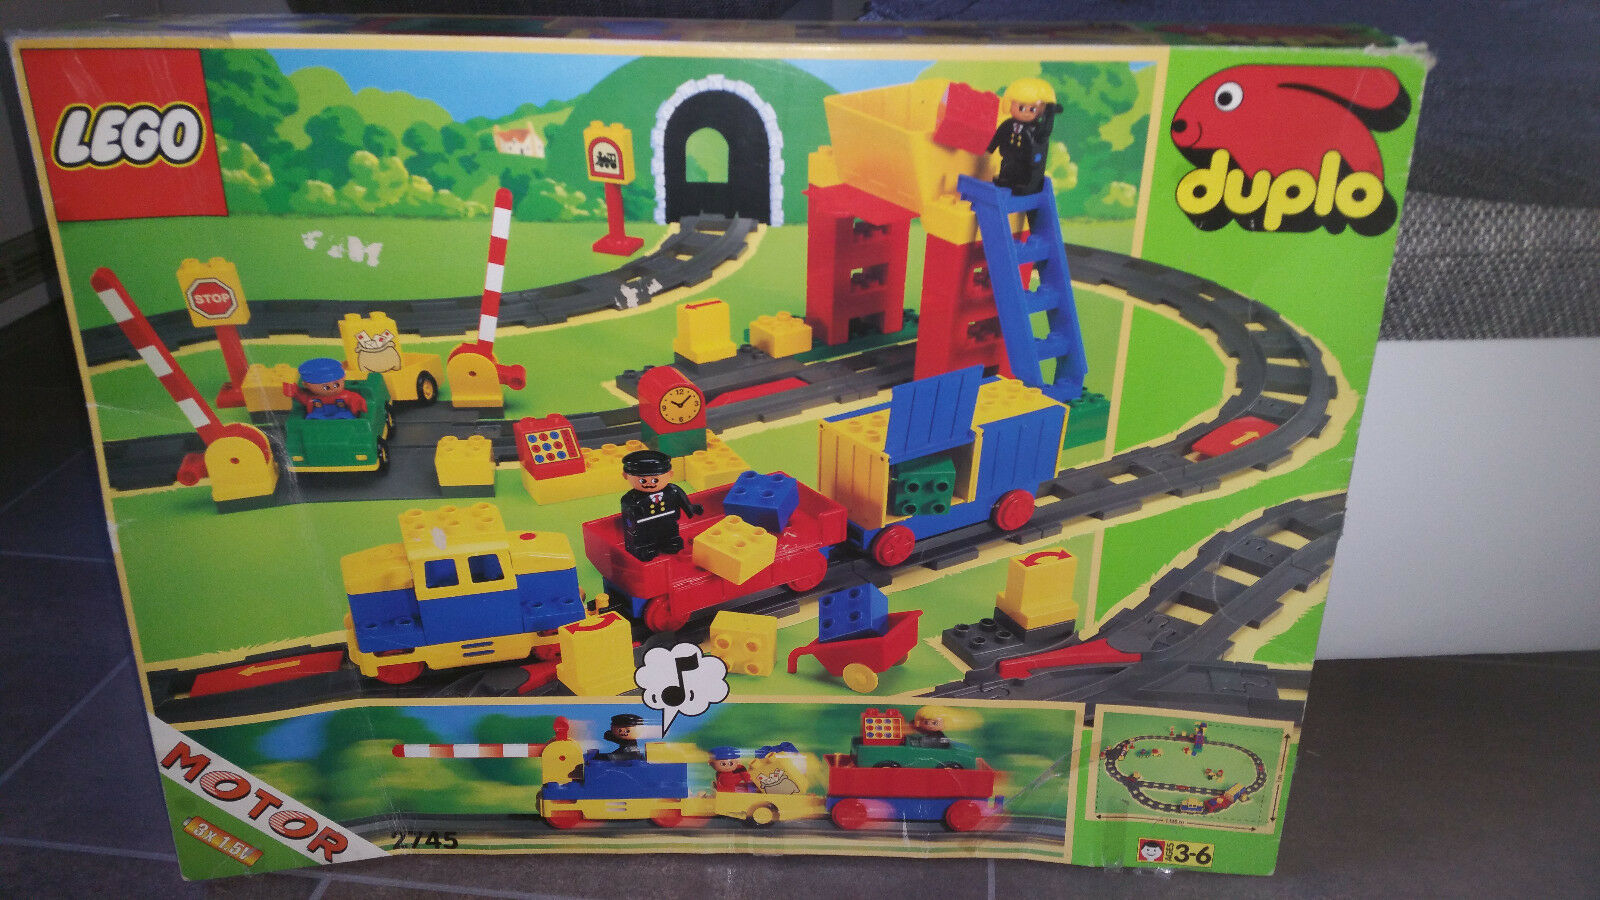 Lego Duplo 2745 Eisenbahn Set Zug Lok Diesellok 100% komplett in OVP